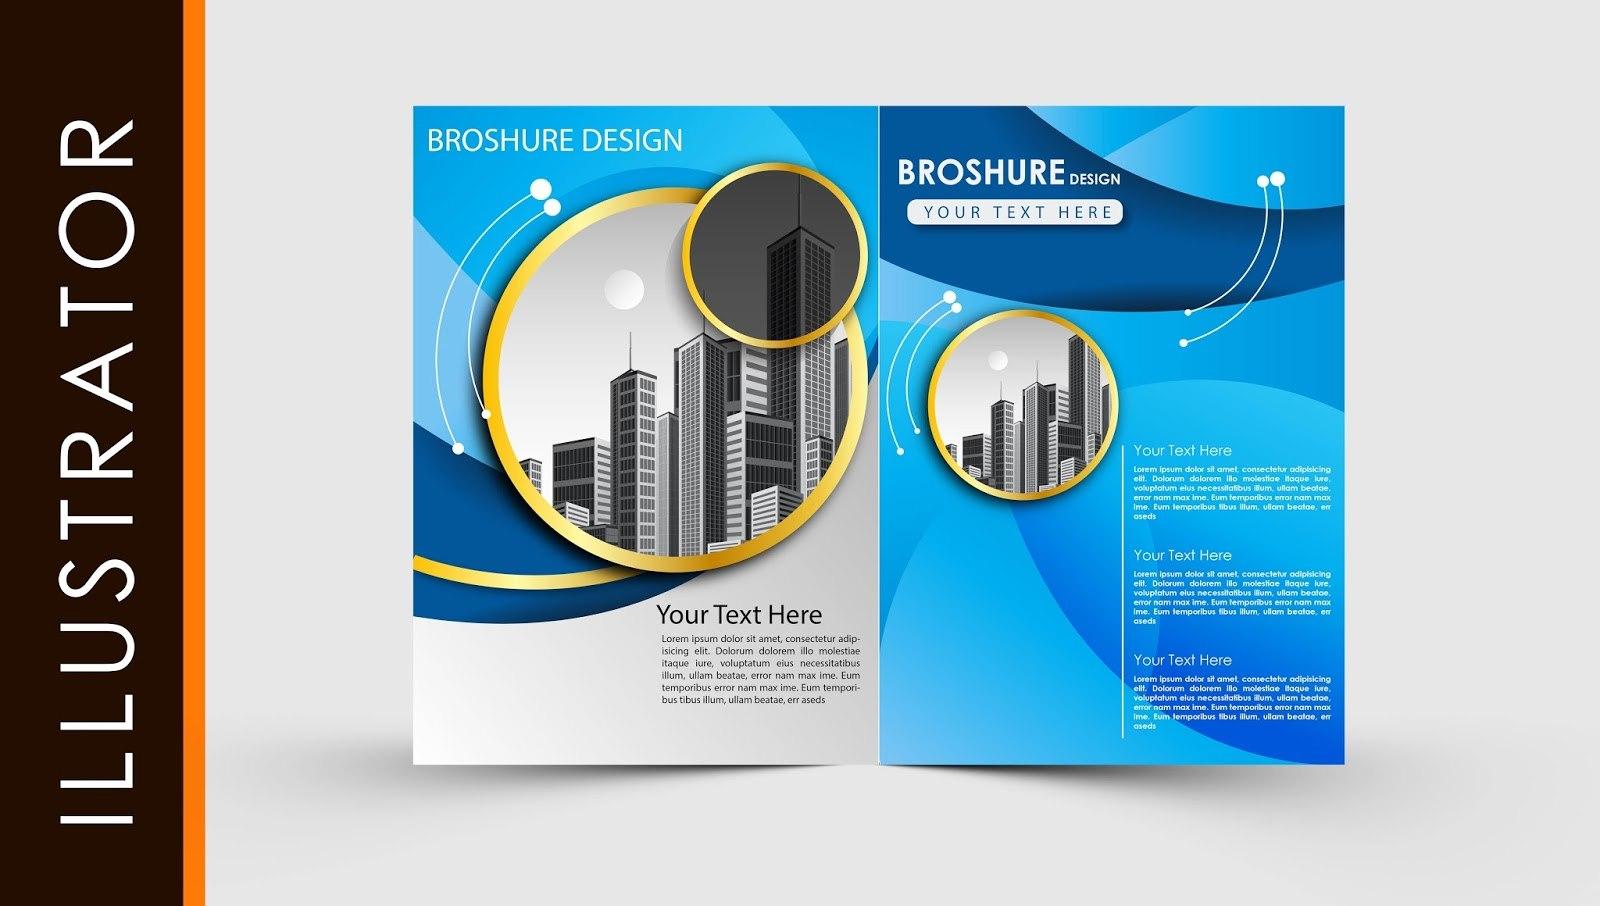 Free Download Adobe Illustrator Template Brochure Two Fold Pertaining To Brochure Templates Adobe Illustrator